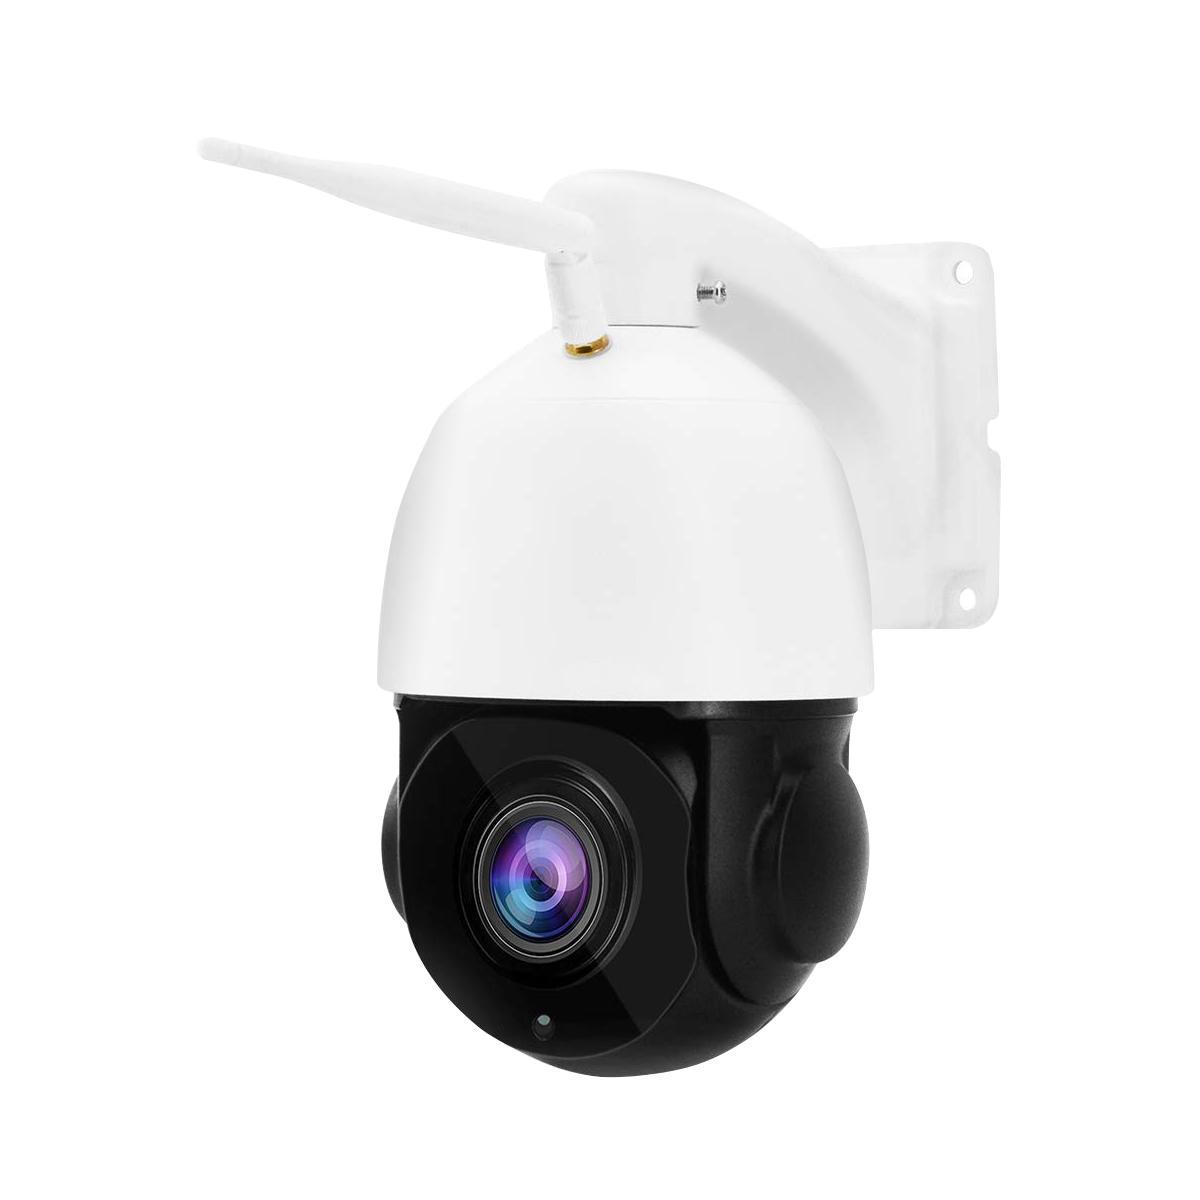 1080 P 30X Zoom WIFI 2.0MP Kamera PTZ IP Pan / Tilt Speed Dome Kamera Audio Wodoodporna Home Security Cameras